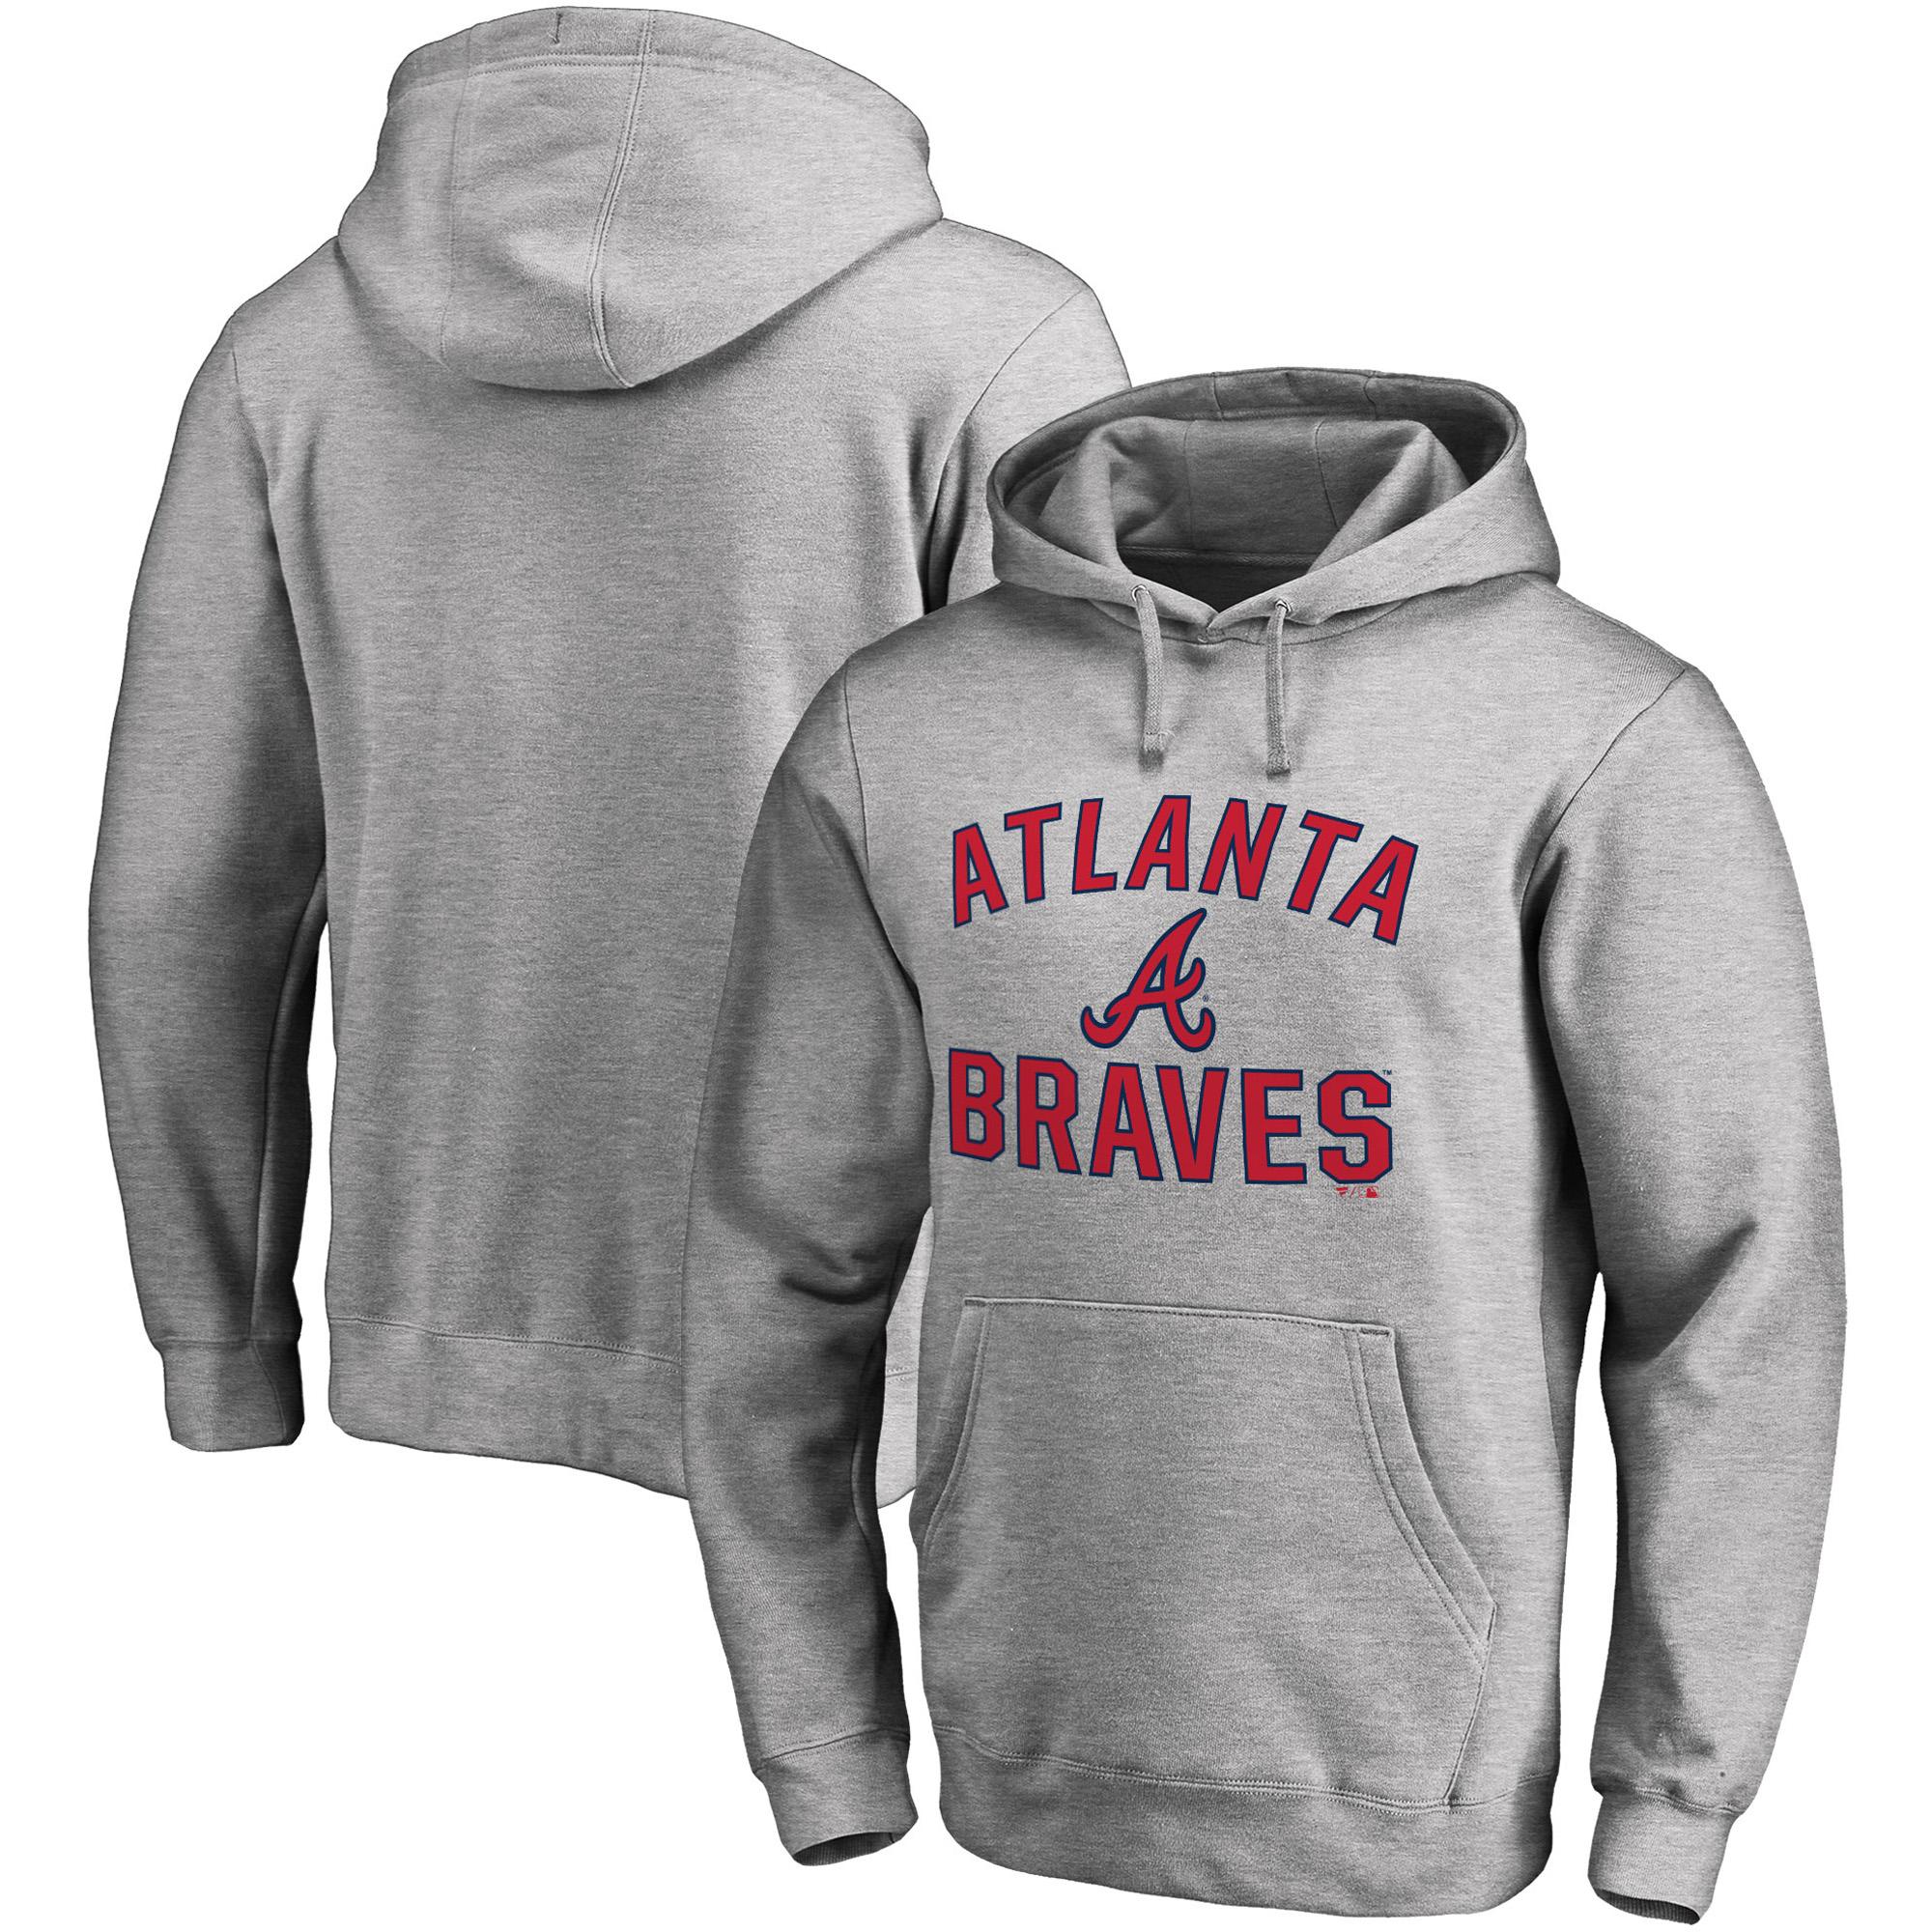 Atlanta Braves Fanatics Branded Victory Arch Pullover Hoodie - Heathered Gray